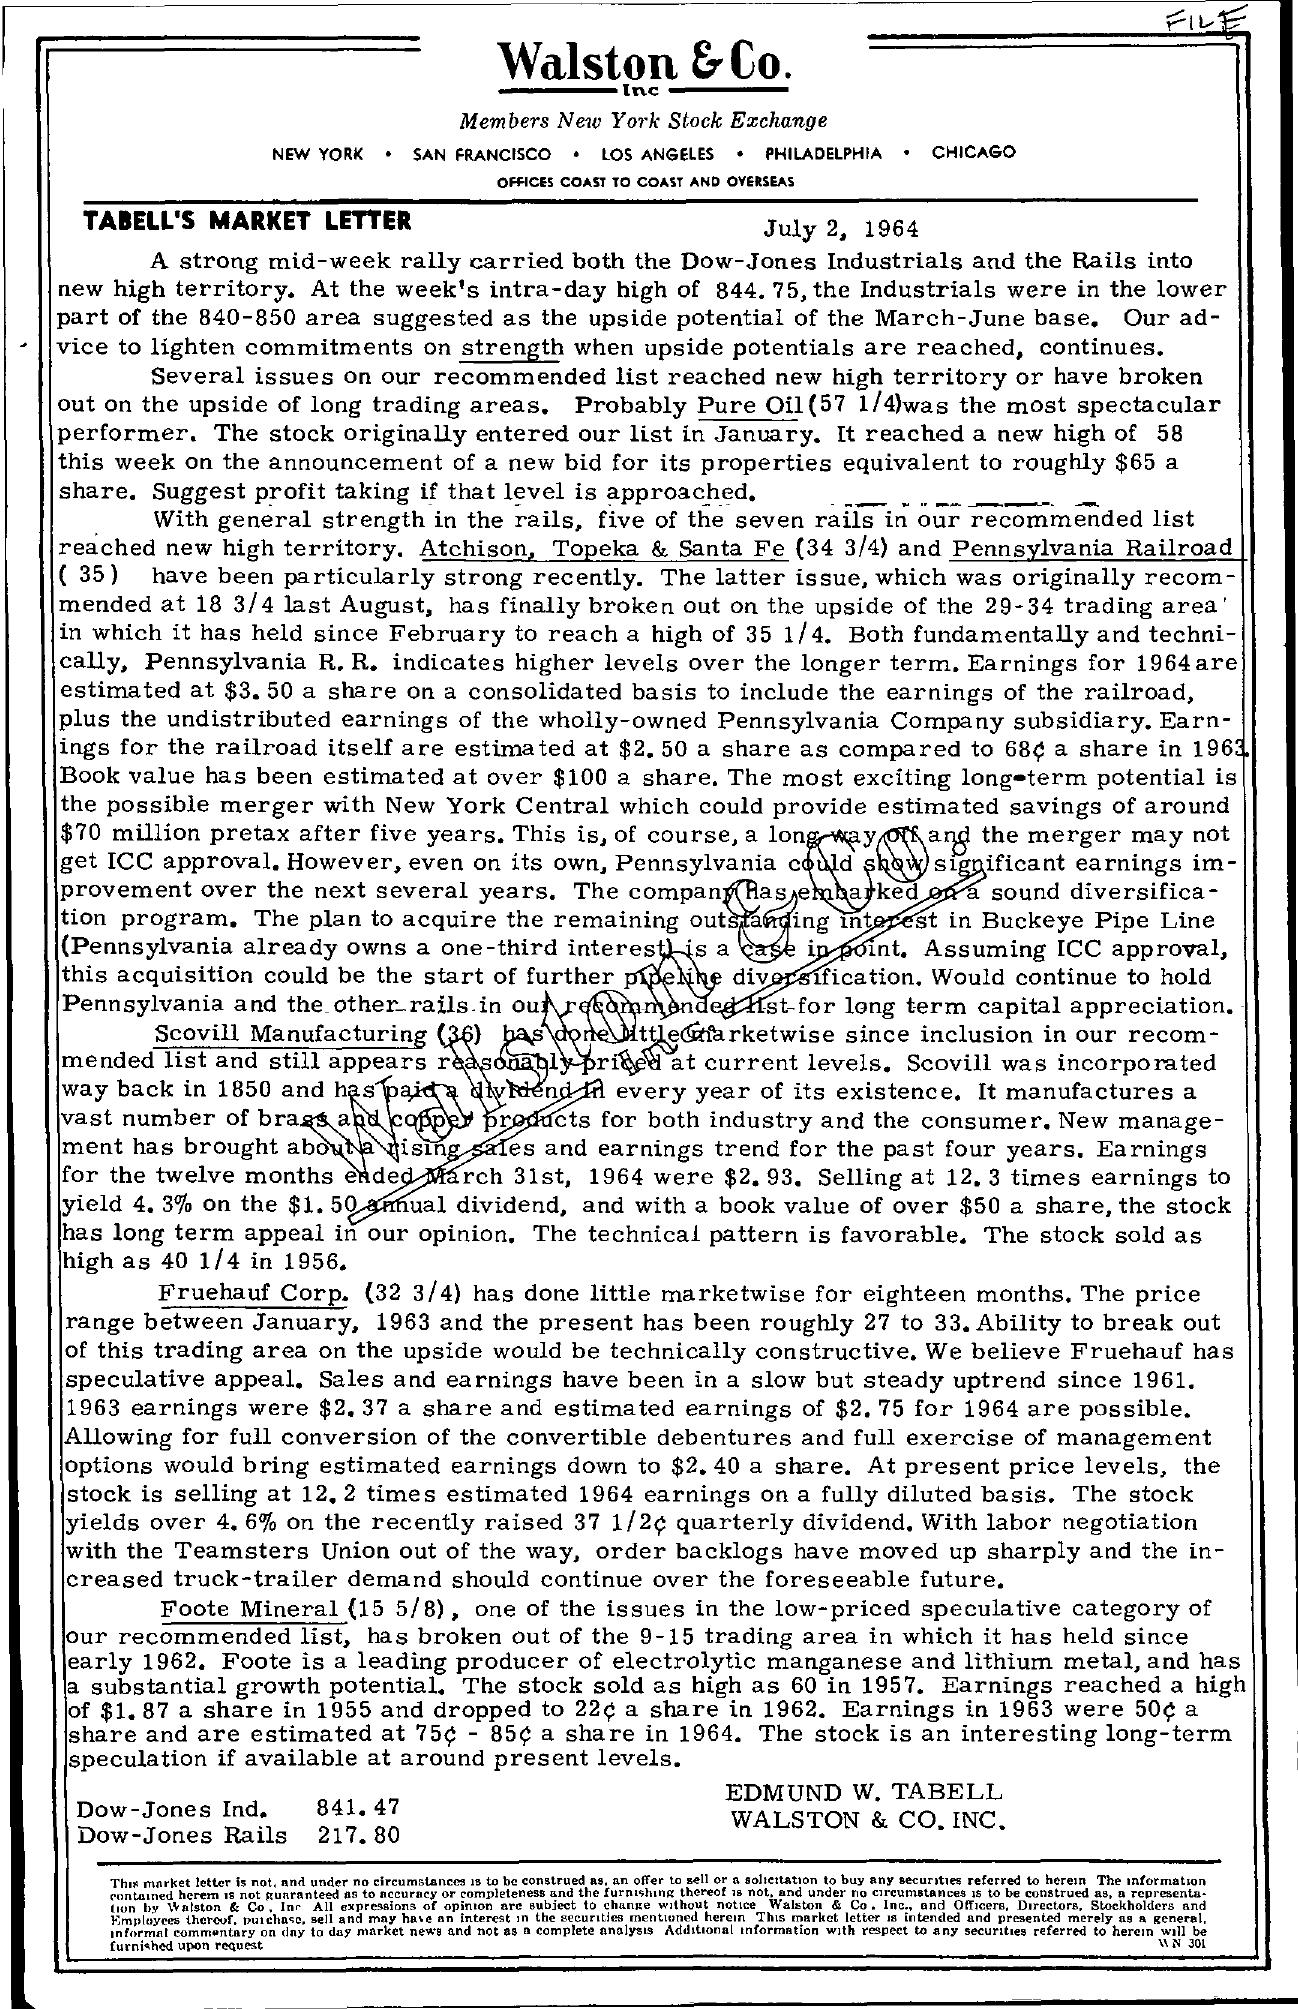 Tabell's Market Letter - July 02, 1964